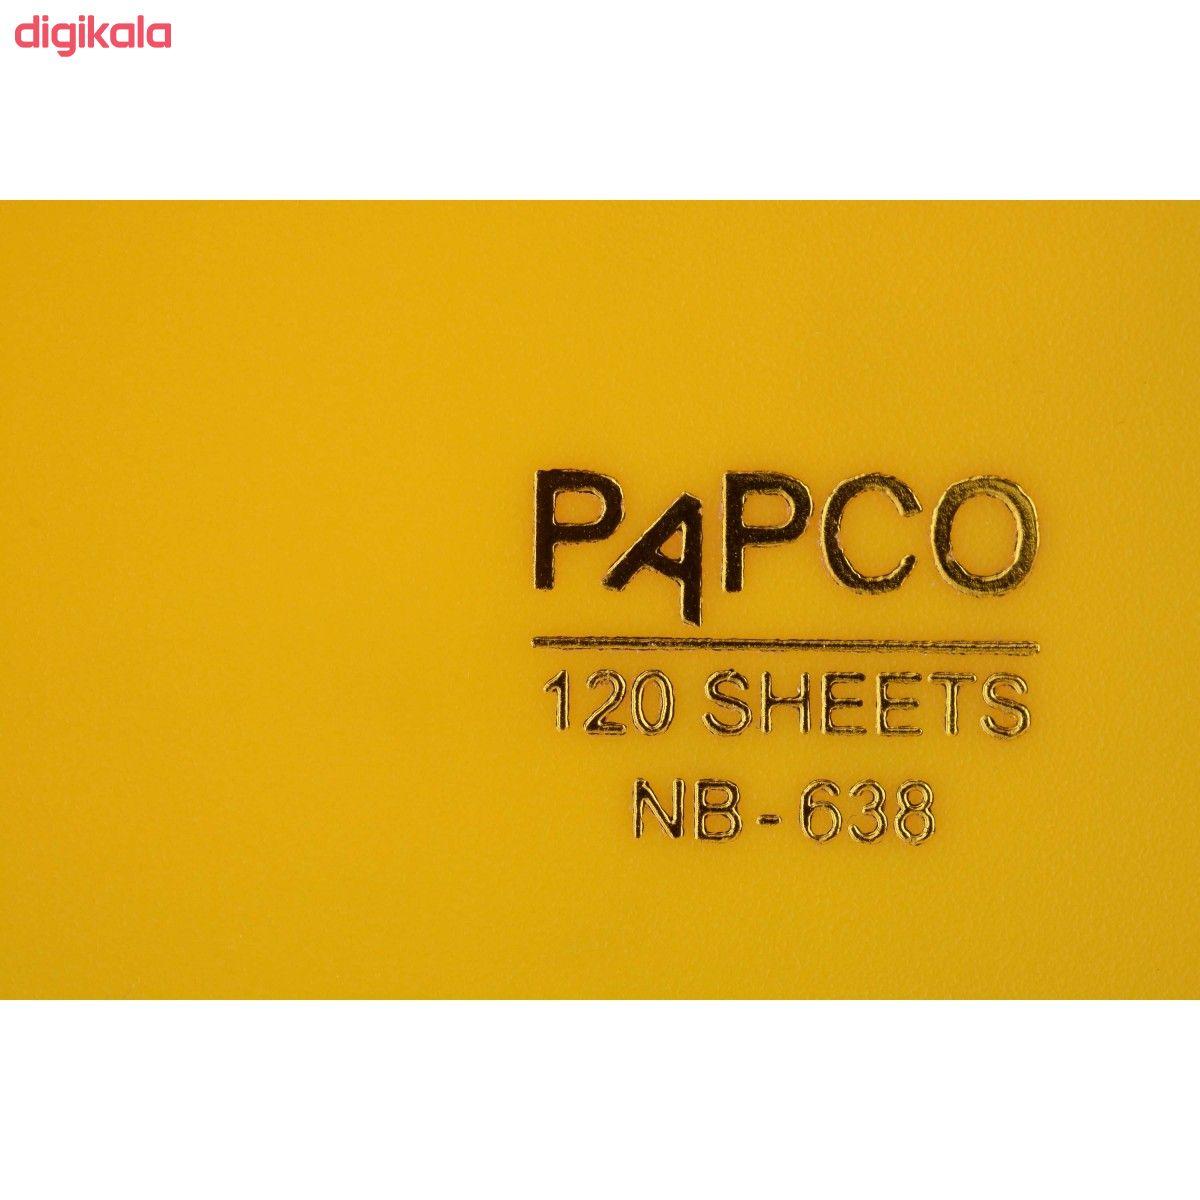 دفتر یادداشت 120 برگ پاپکو مدل  NB-638 کد HT01 main 1 3